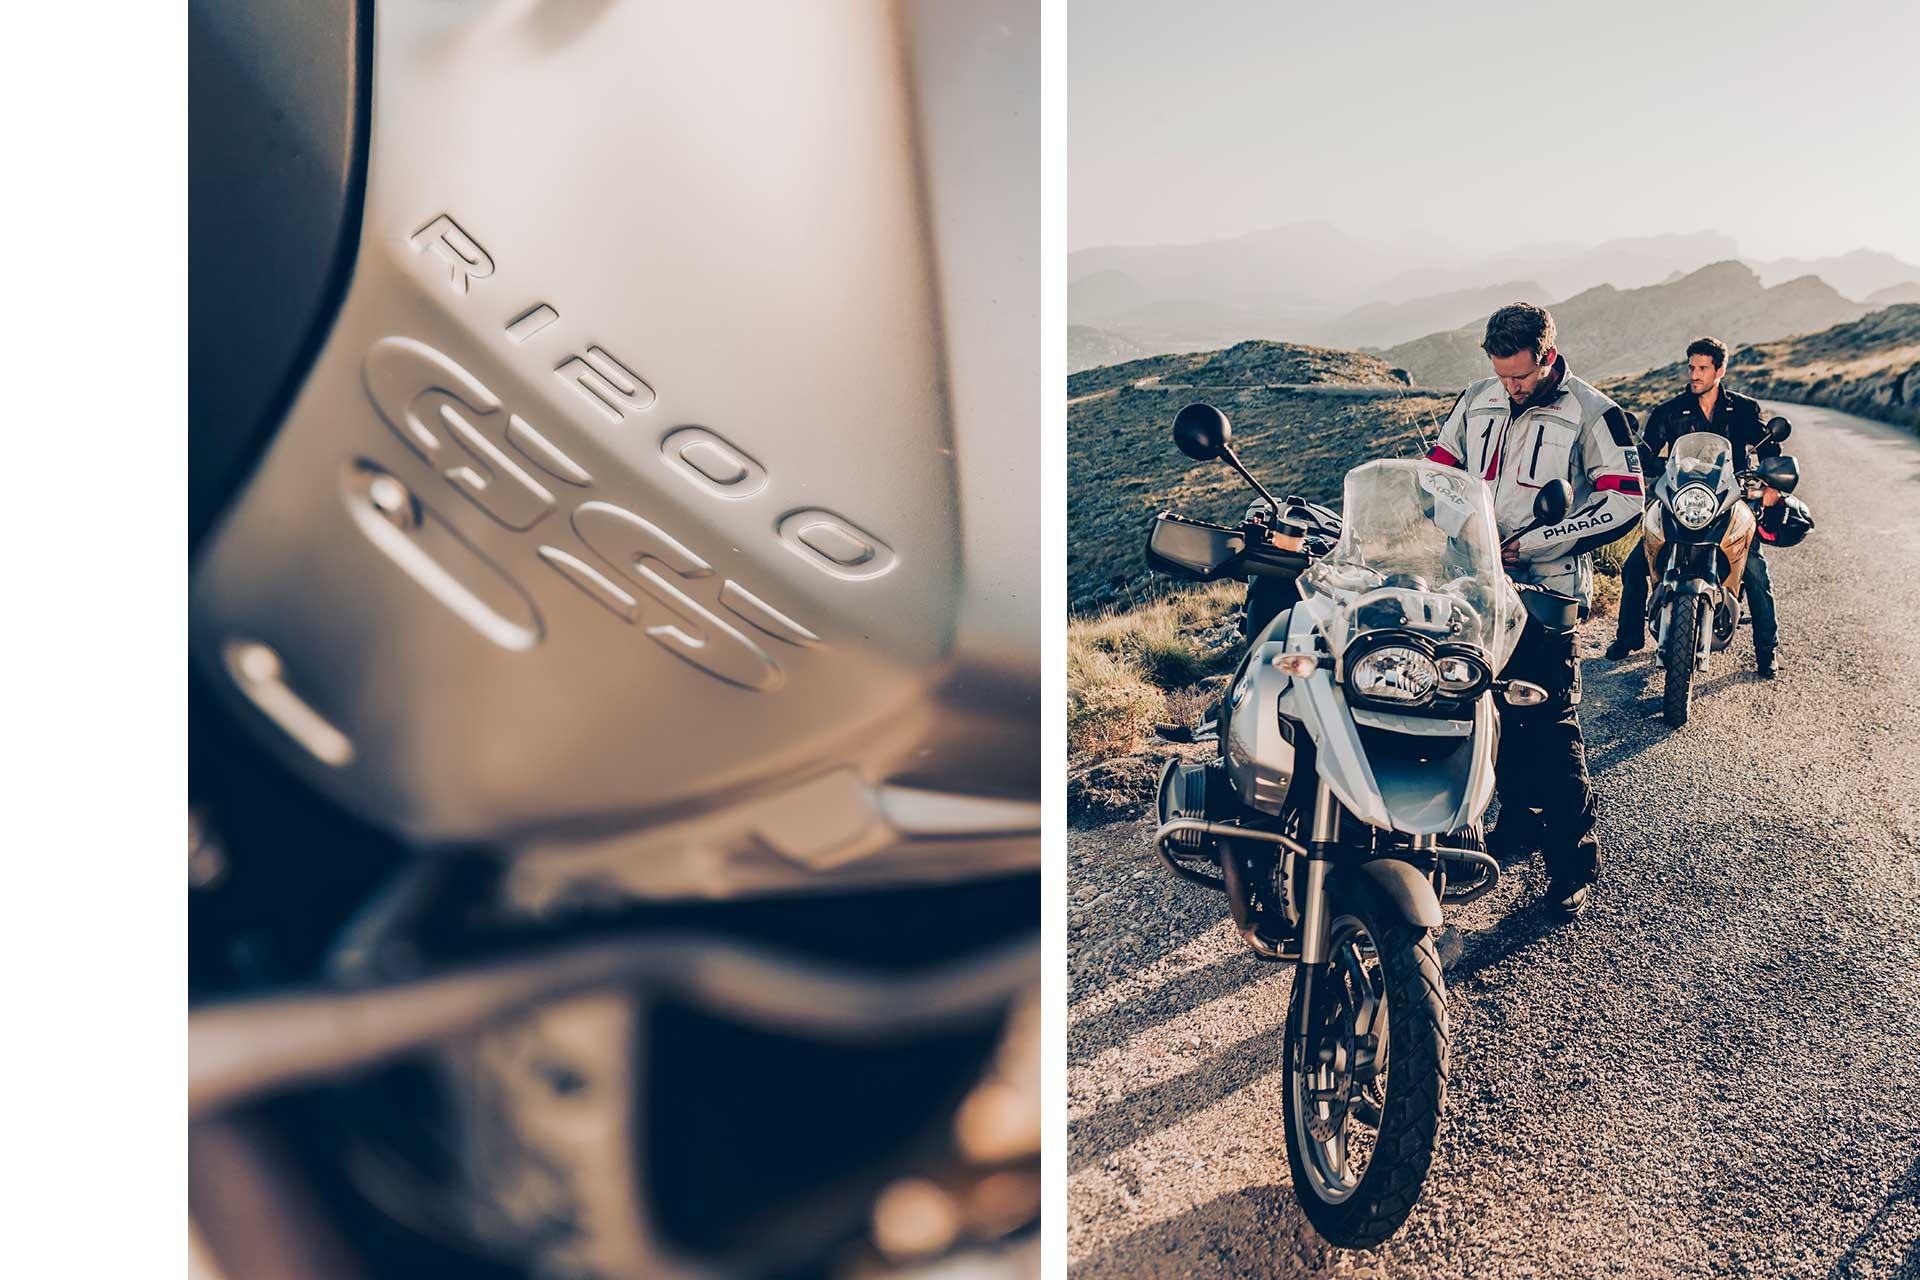 Detail People Motorrad Fotografie Sport Aktion Abenteuer Reise Enduro Reisen Spanien